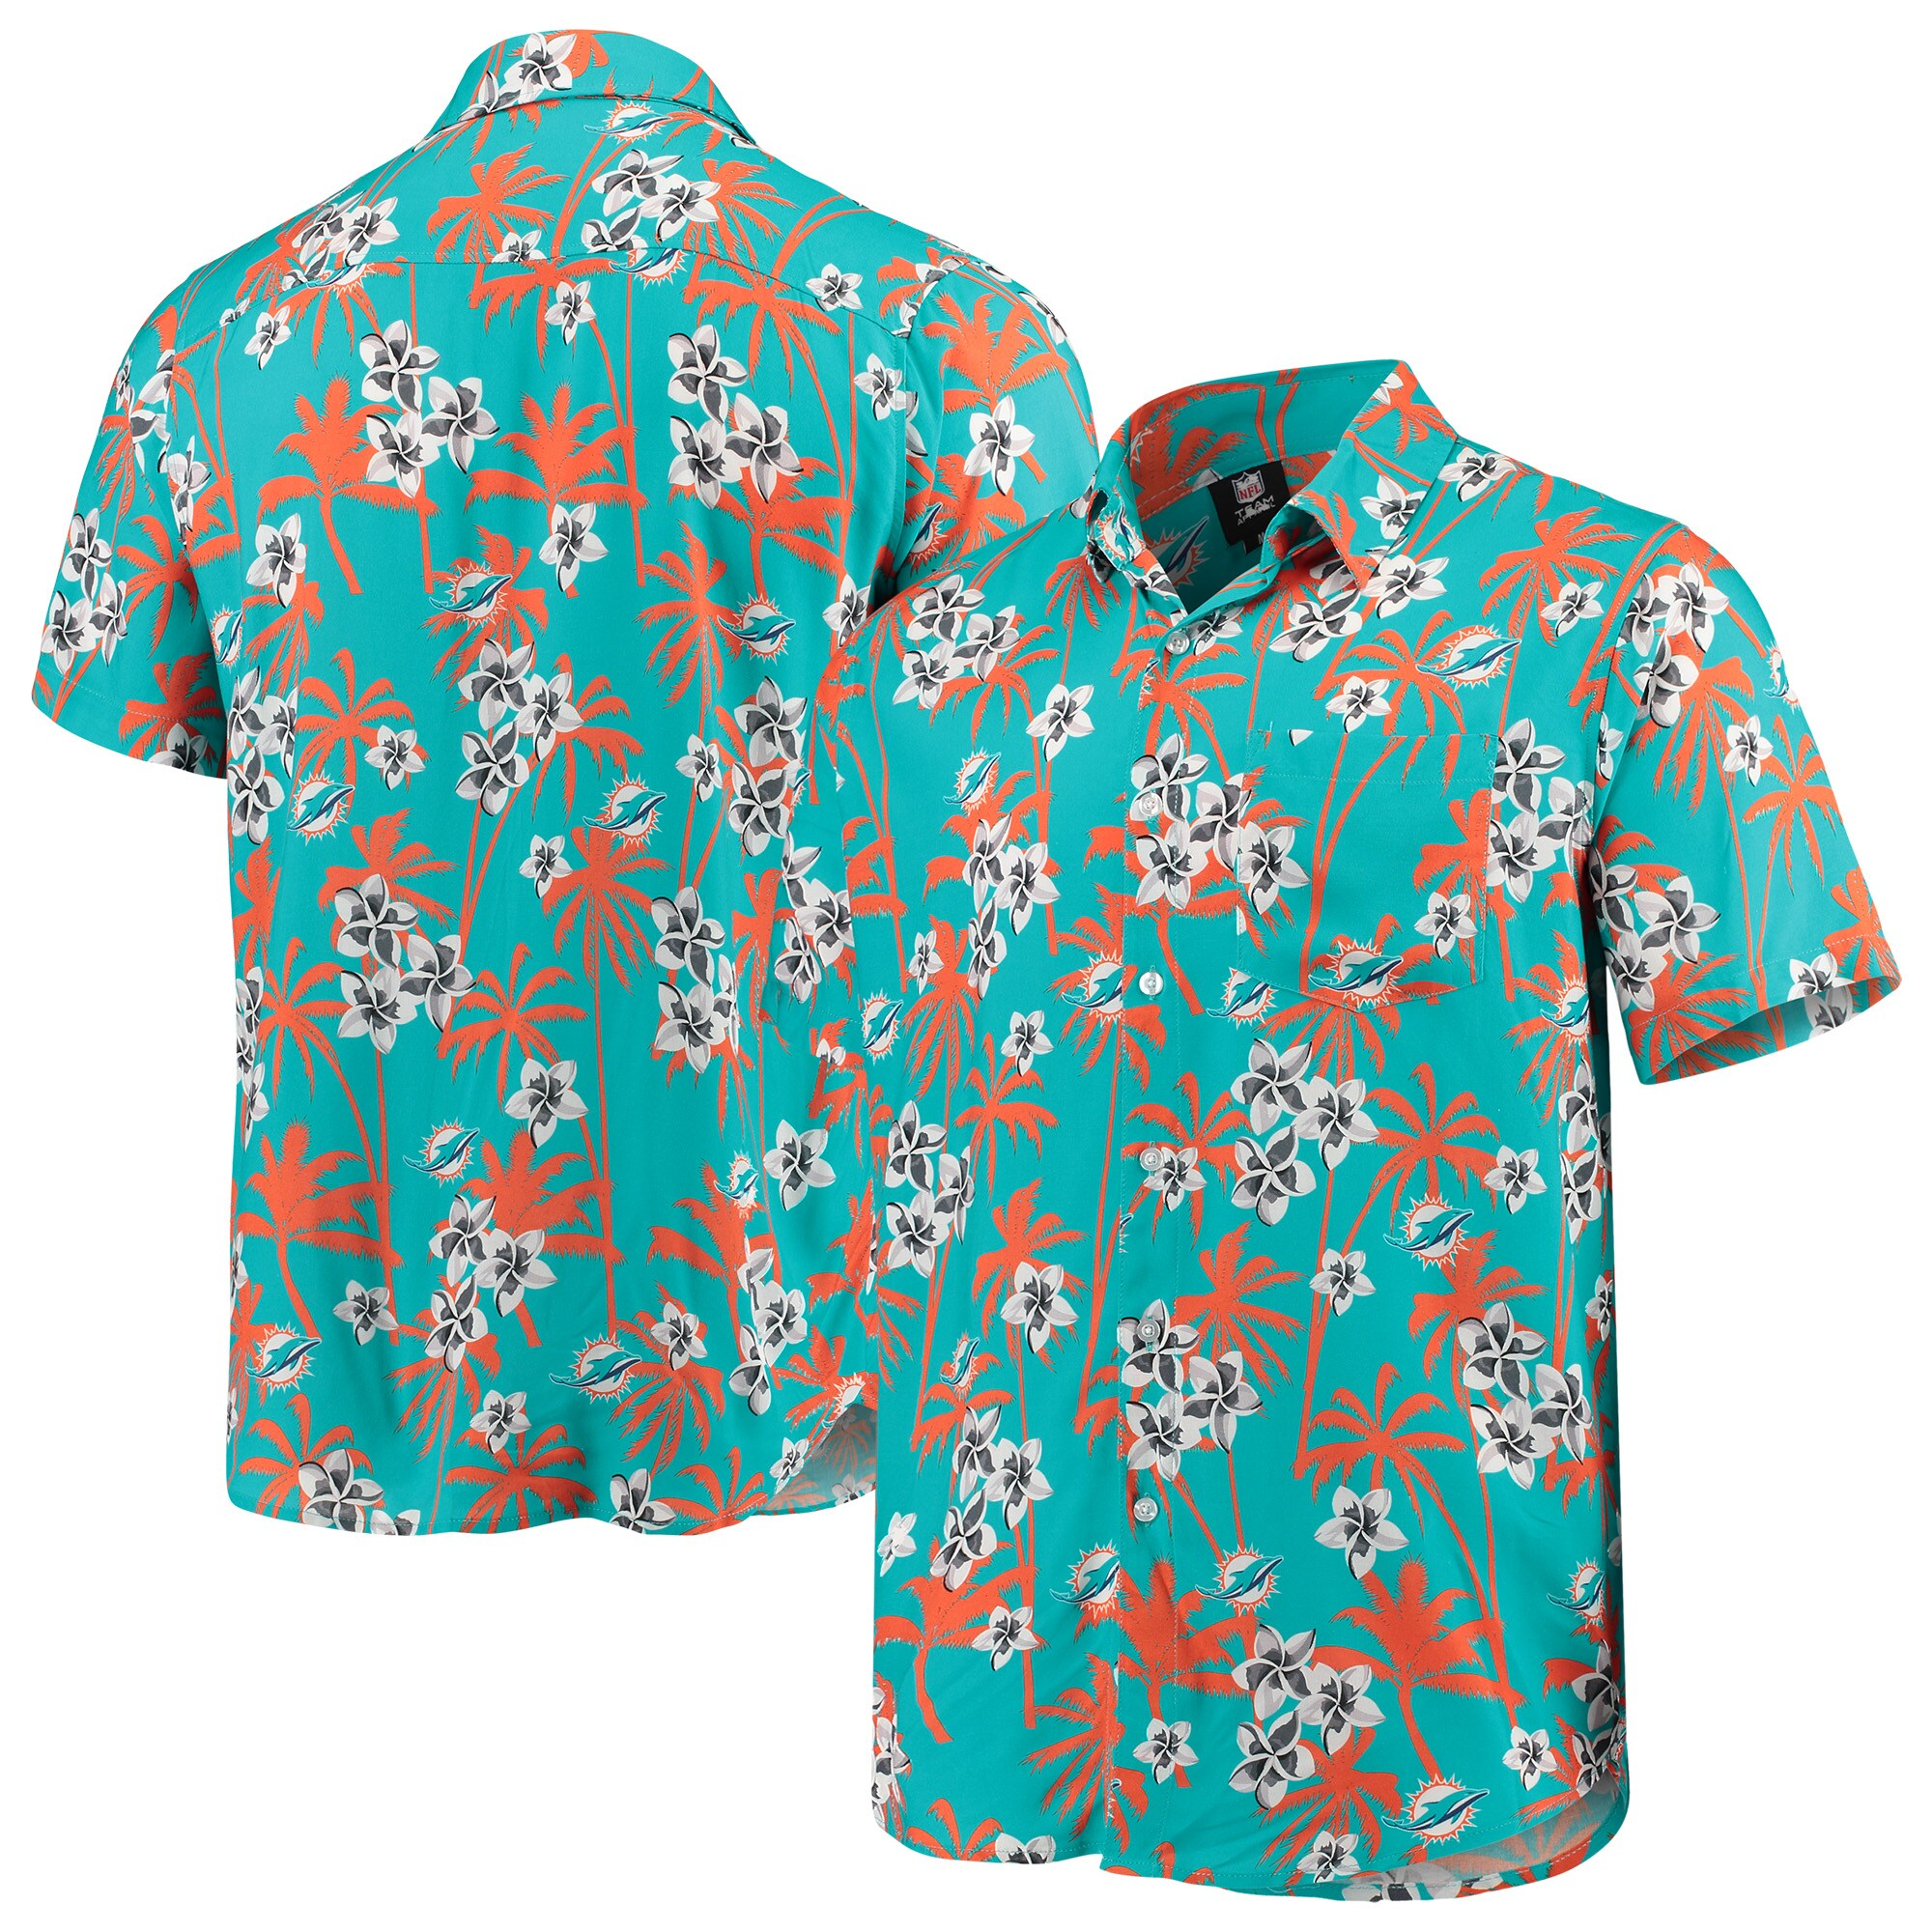 Miami Dolphins Floral Woven Button-Up Shirt - Aqua